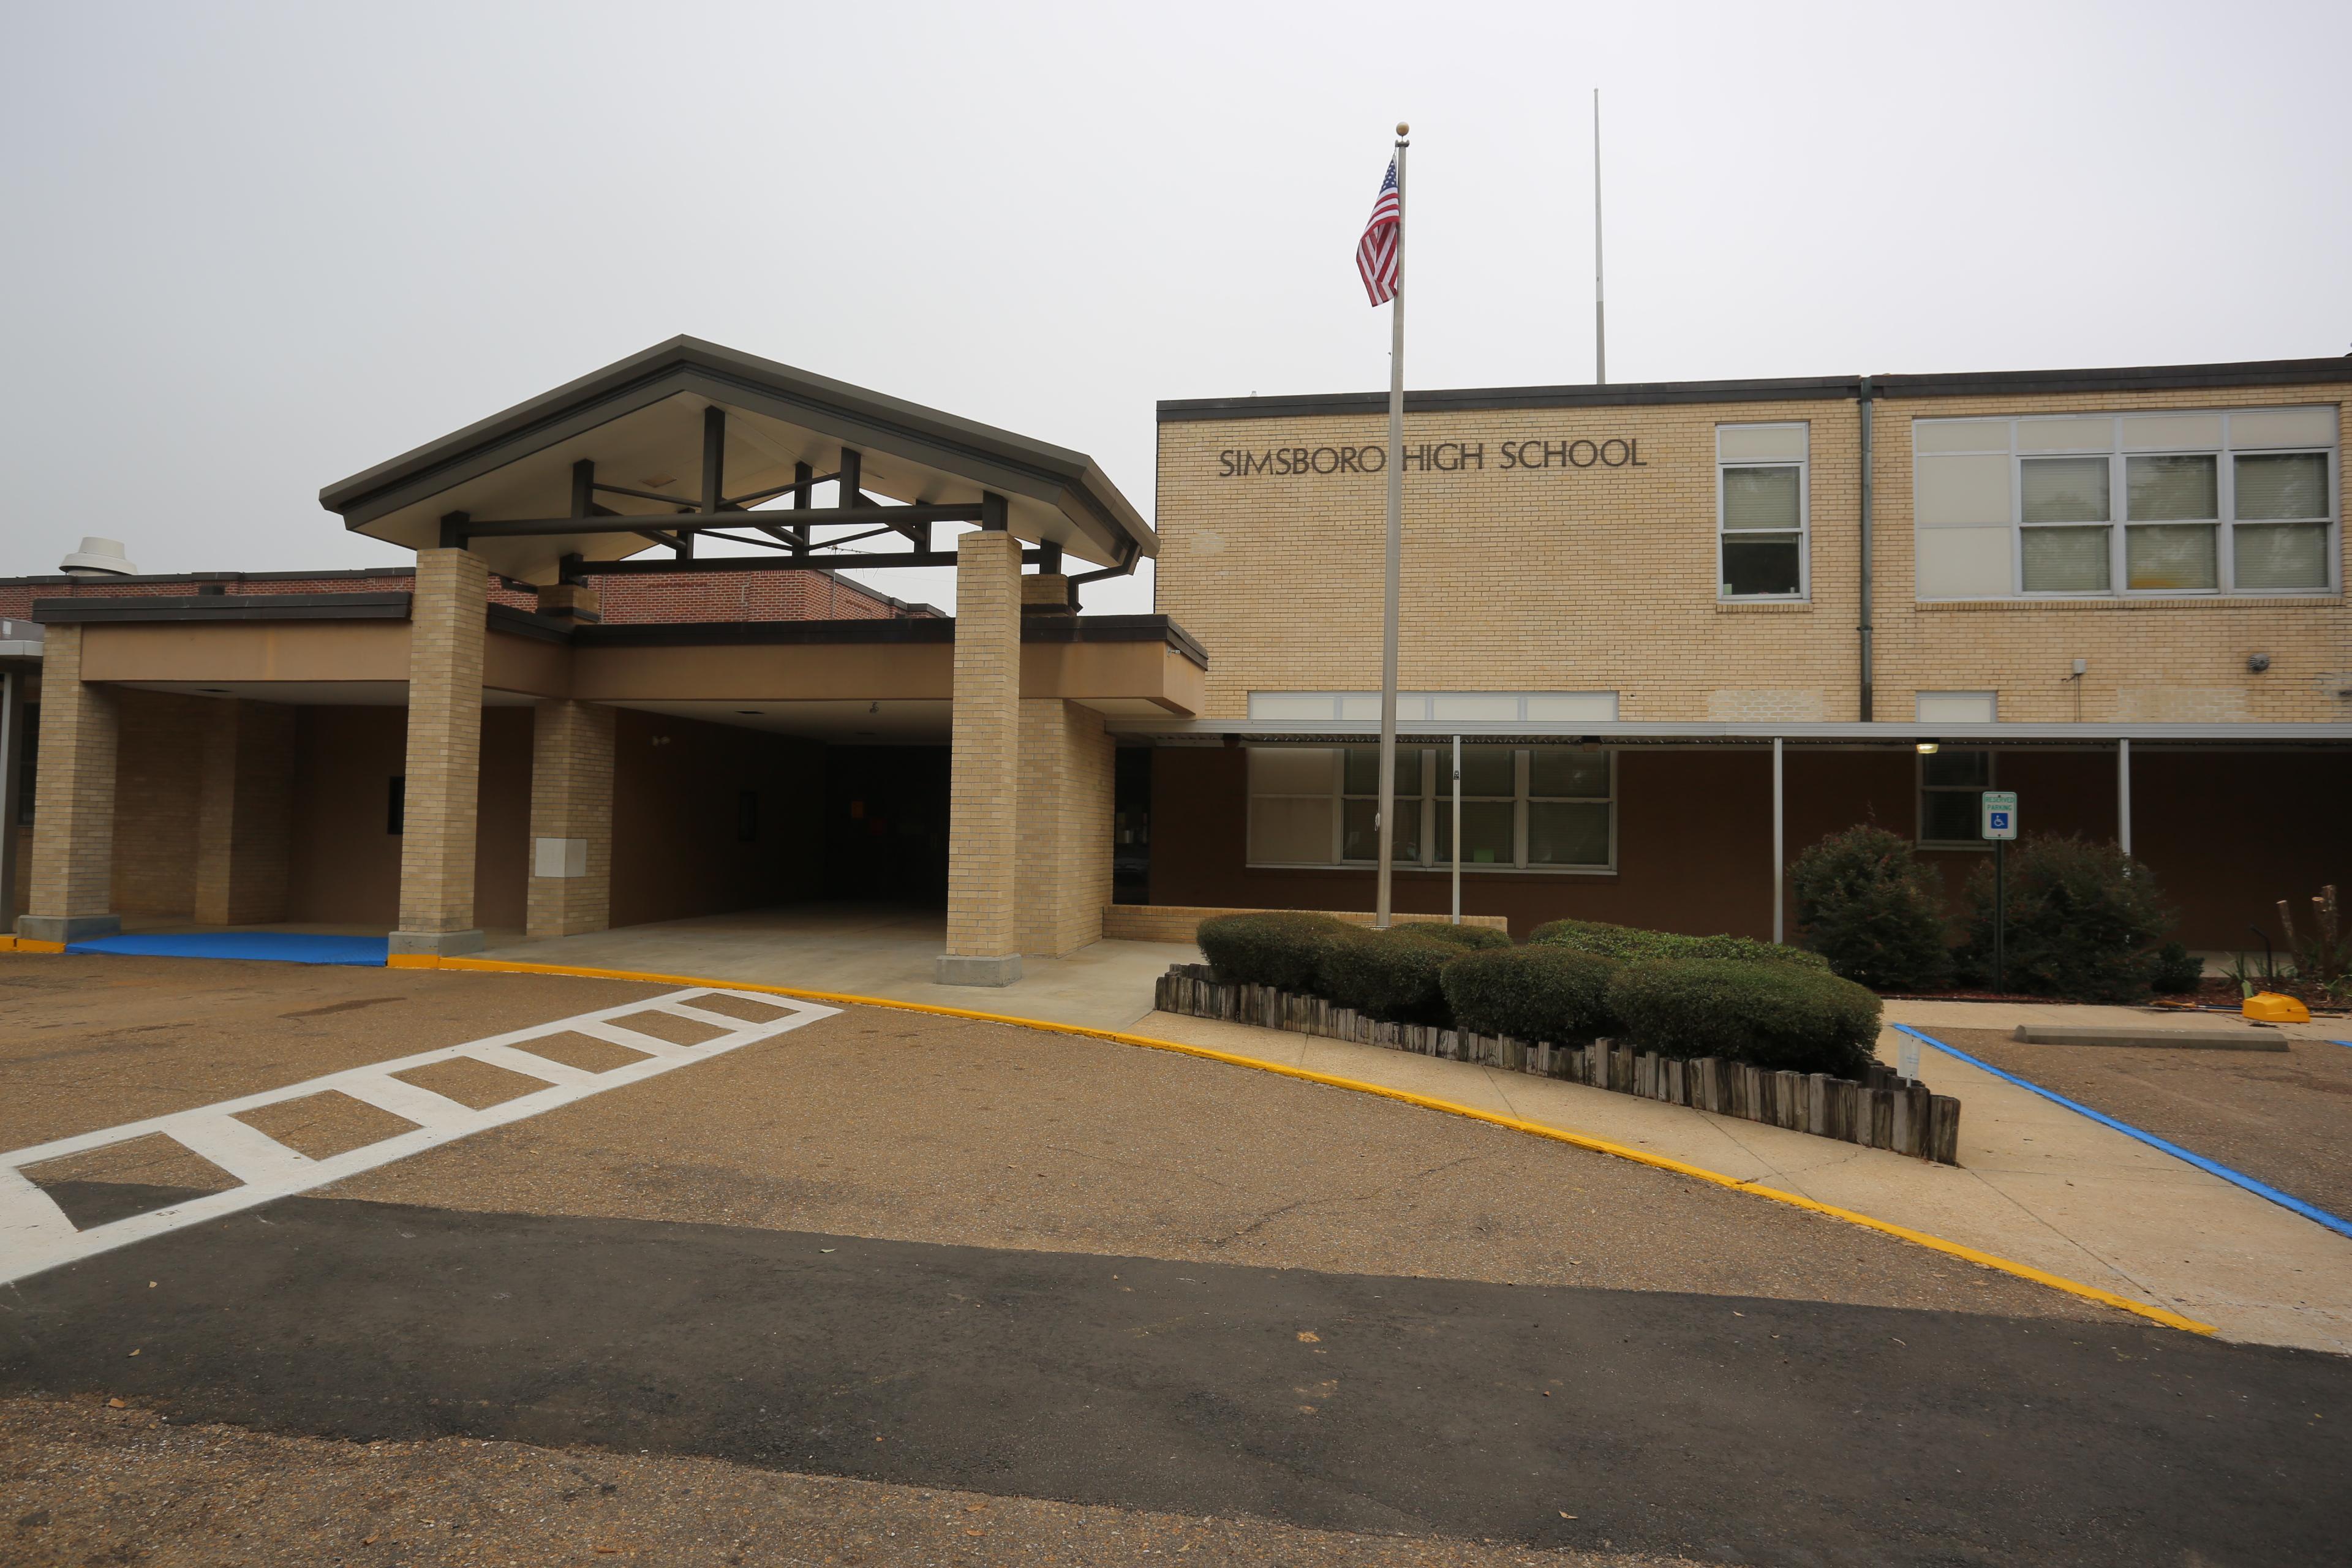 Simboro High School